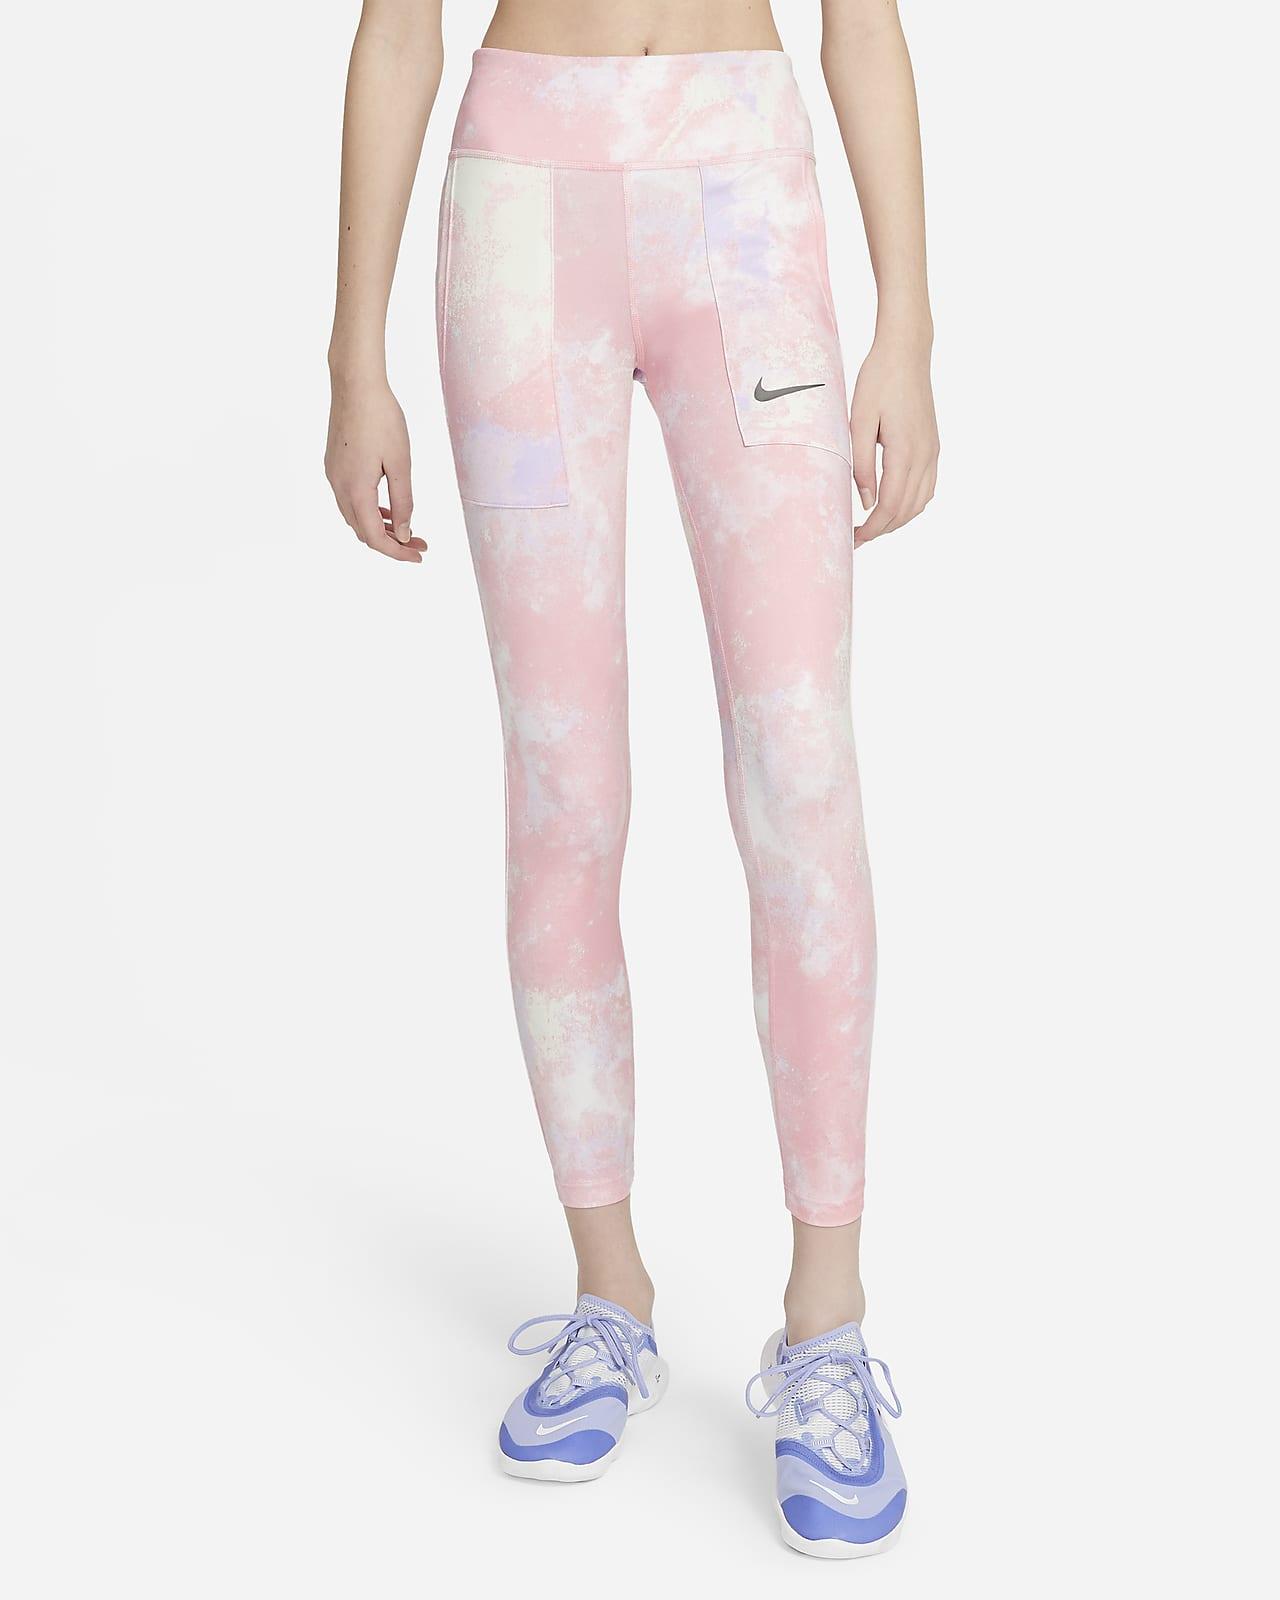 Nike One Leggings estampats i tenyits - Nena